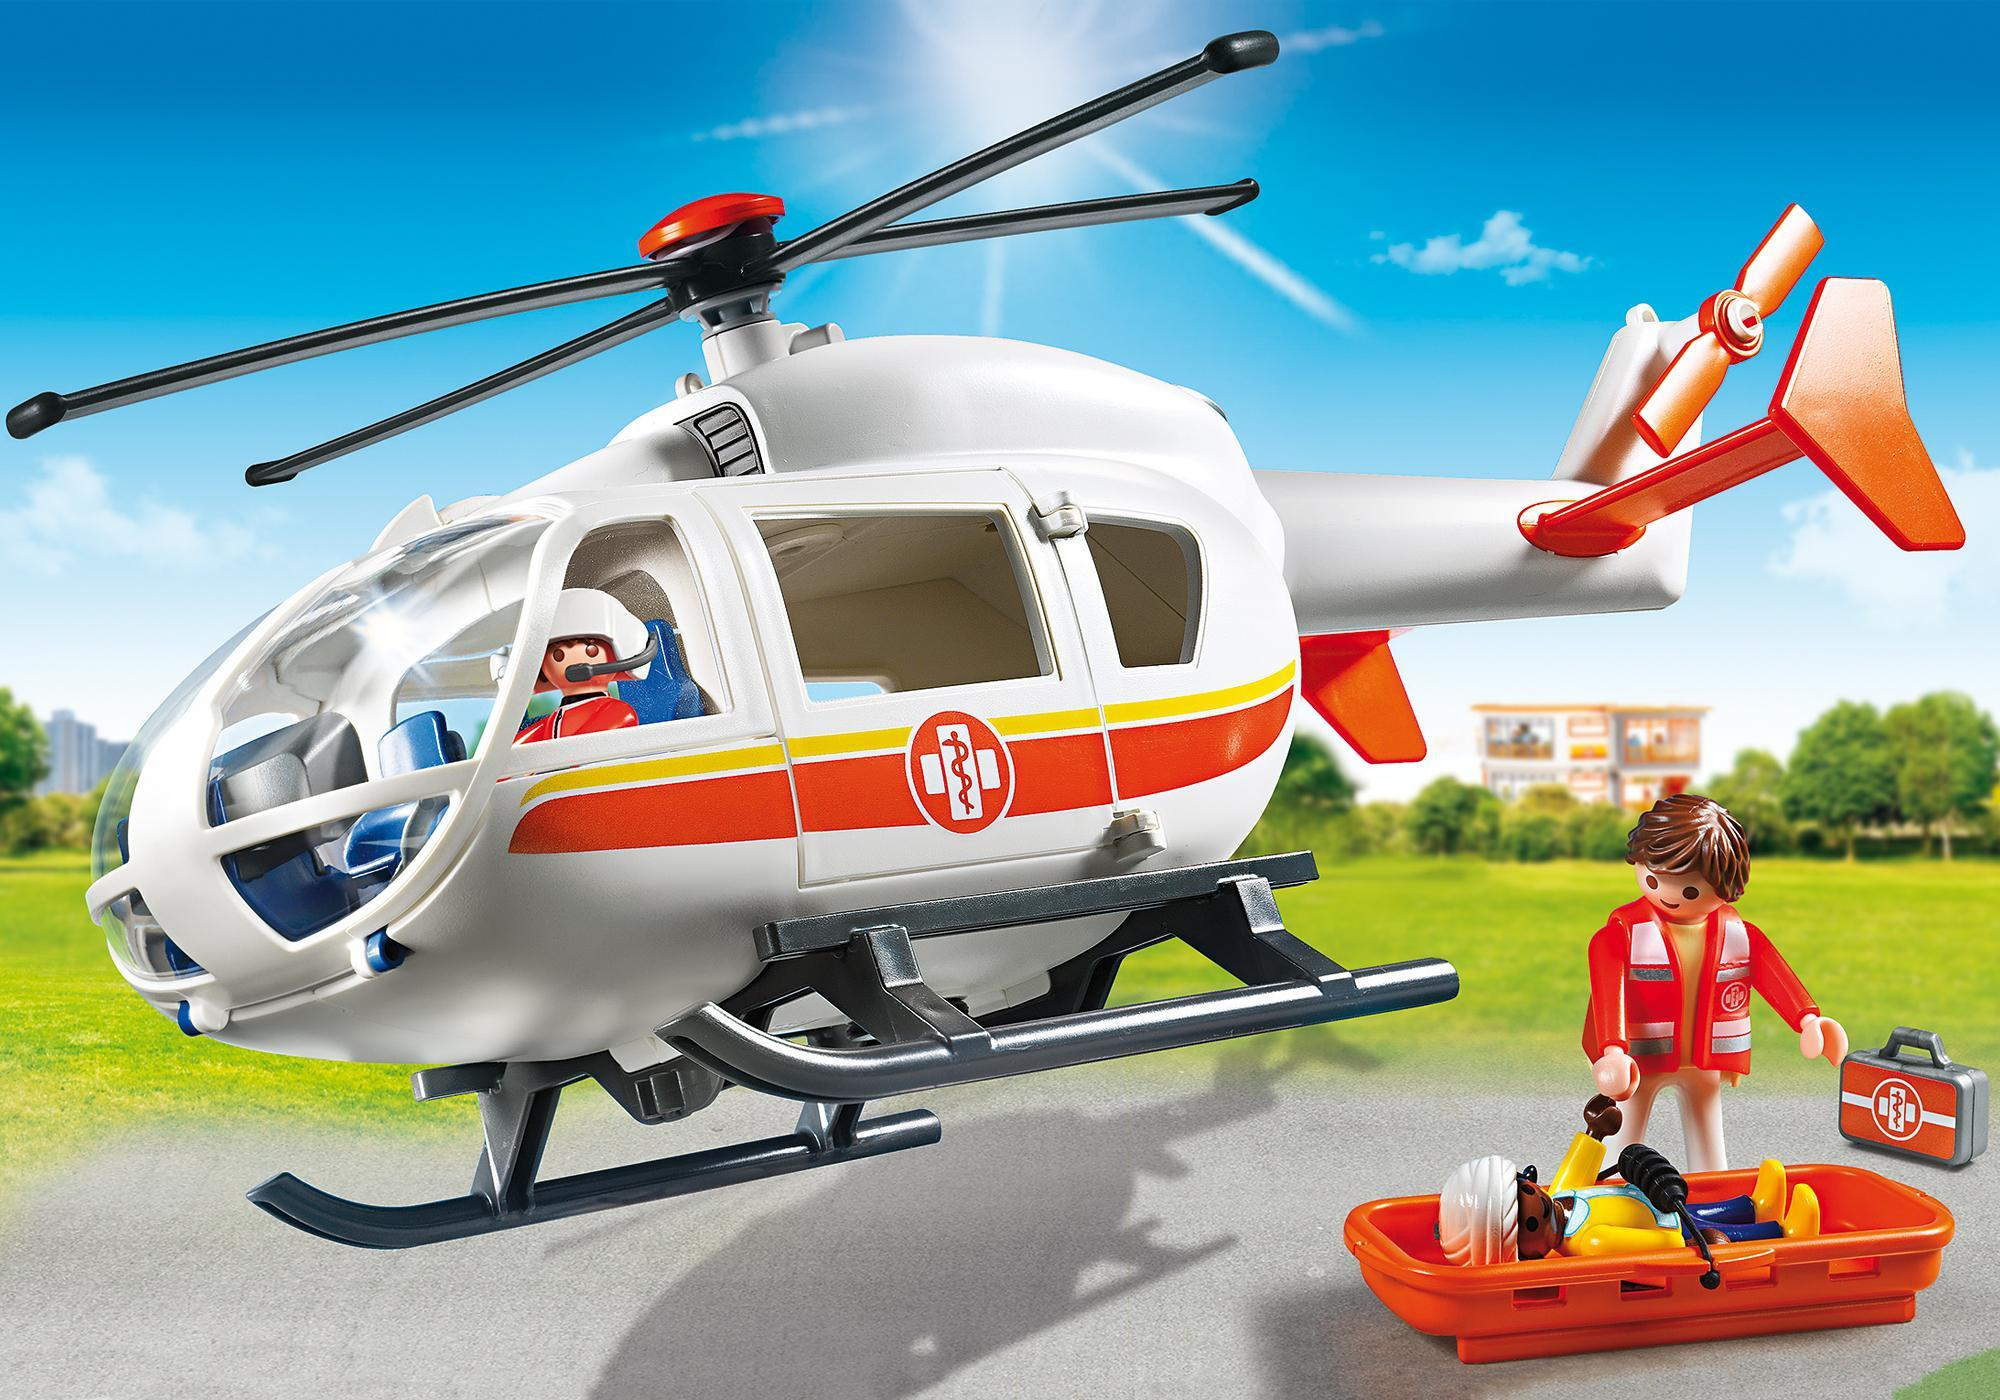 6686_product_detail/Helicóptero Médico de Emergencia